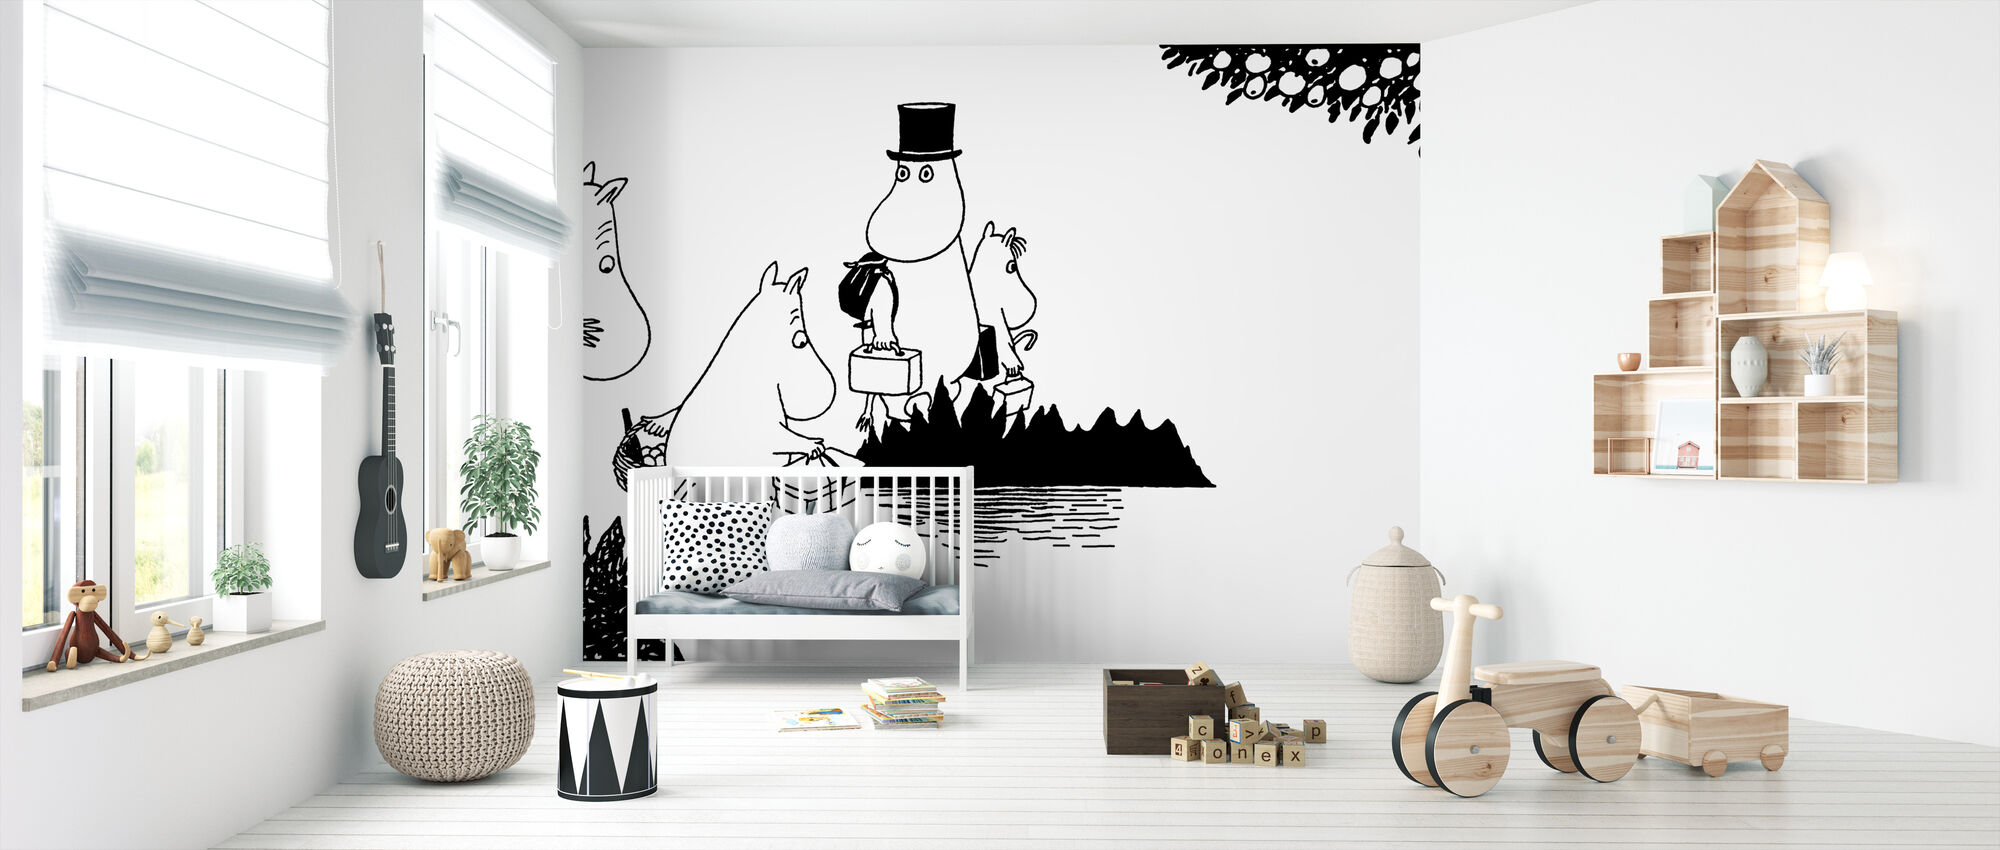 Moomin - Moomin family on Adventure - Wallpaper - Nursery